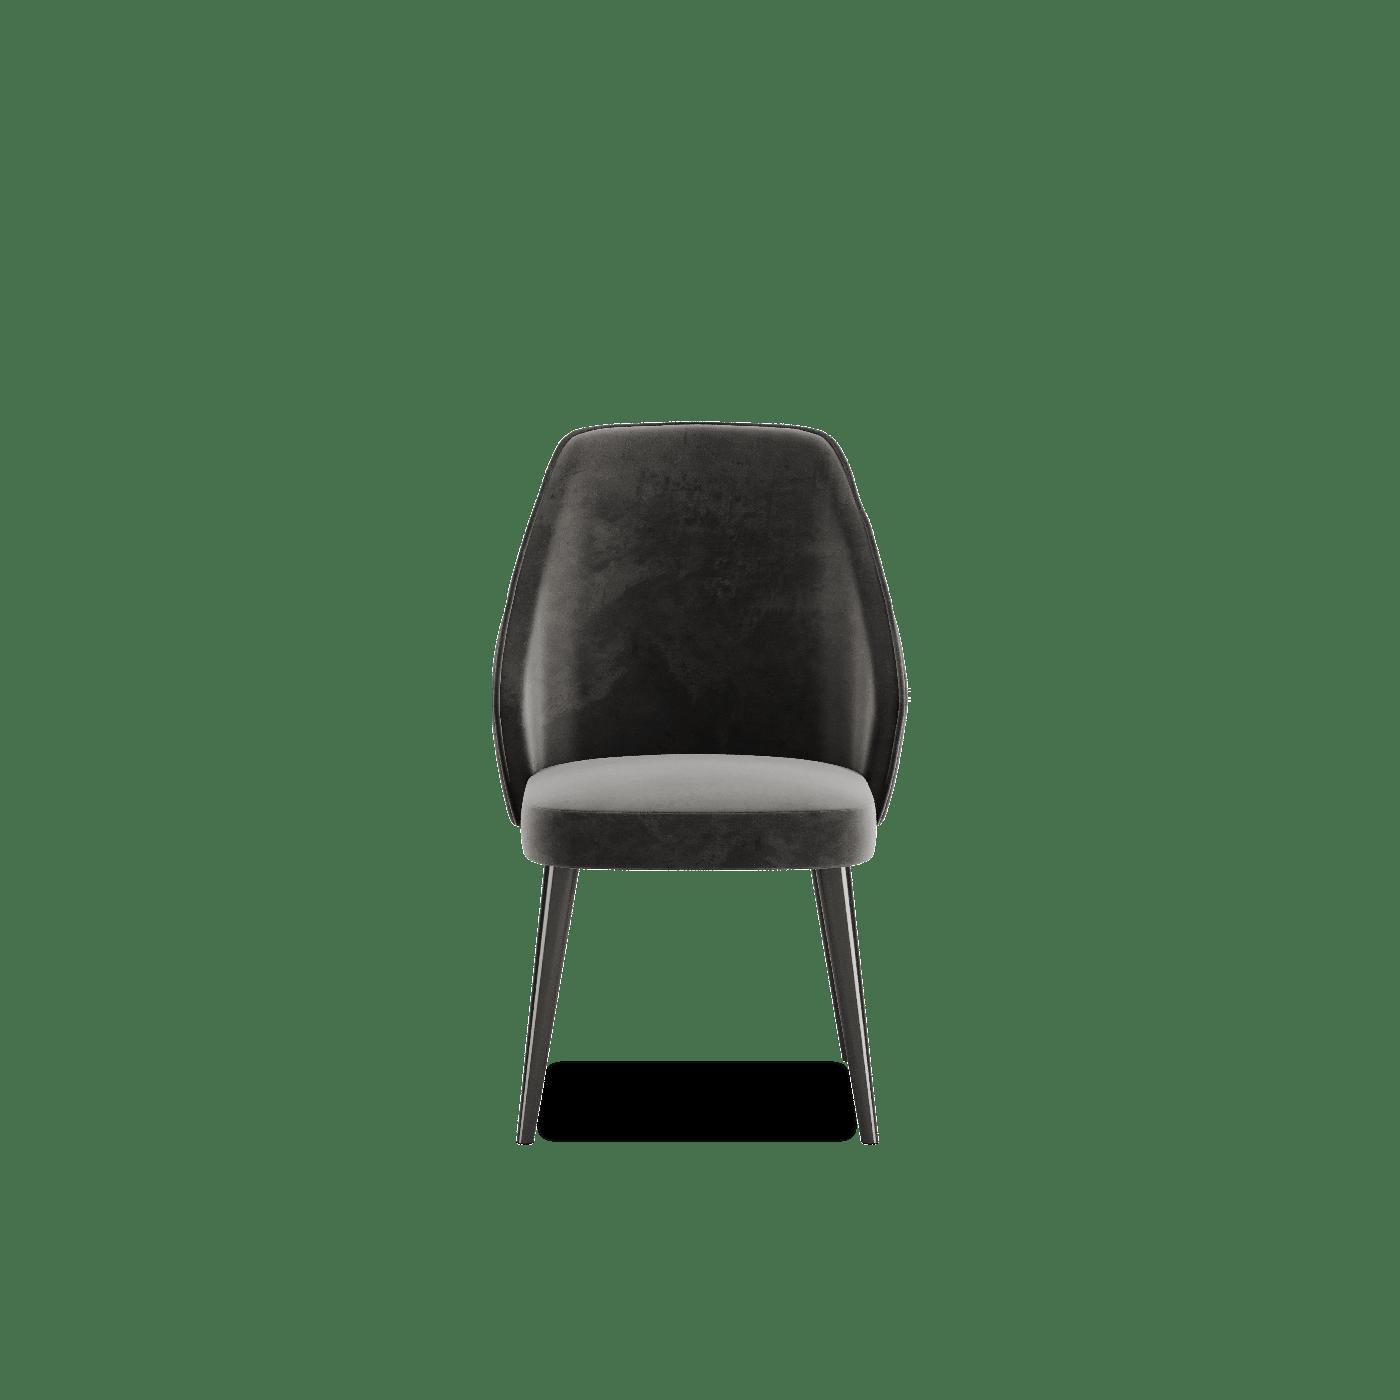 Cartye chair